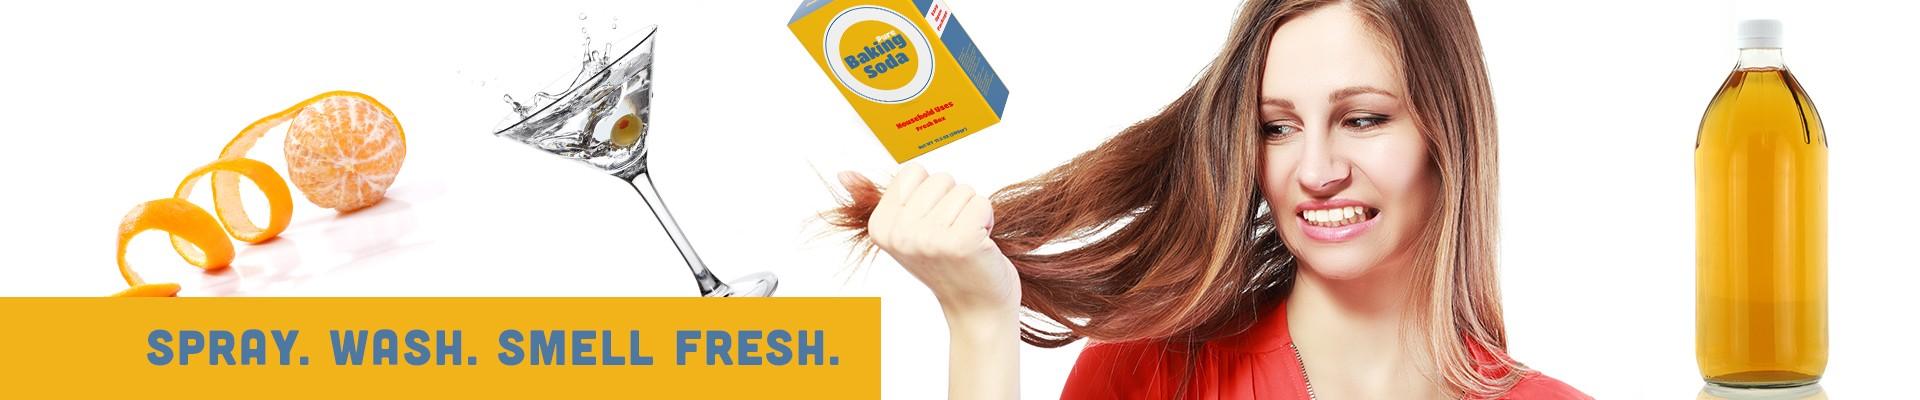 spray-wash-smell-fresh-woman-with-dirty-hair-orange-peel-martini-baking-soda-apple-cider-vinegar